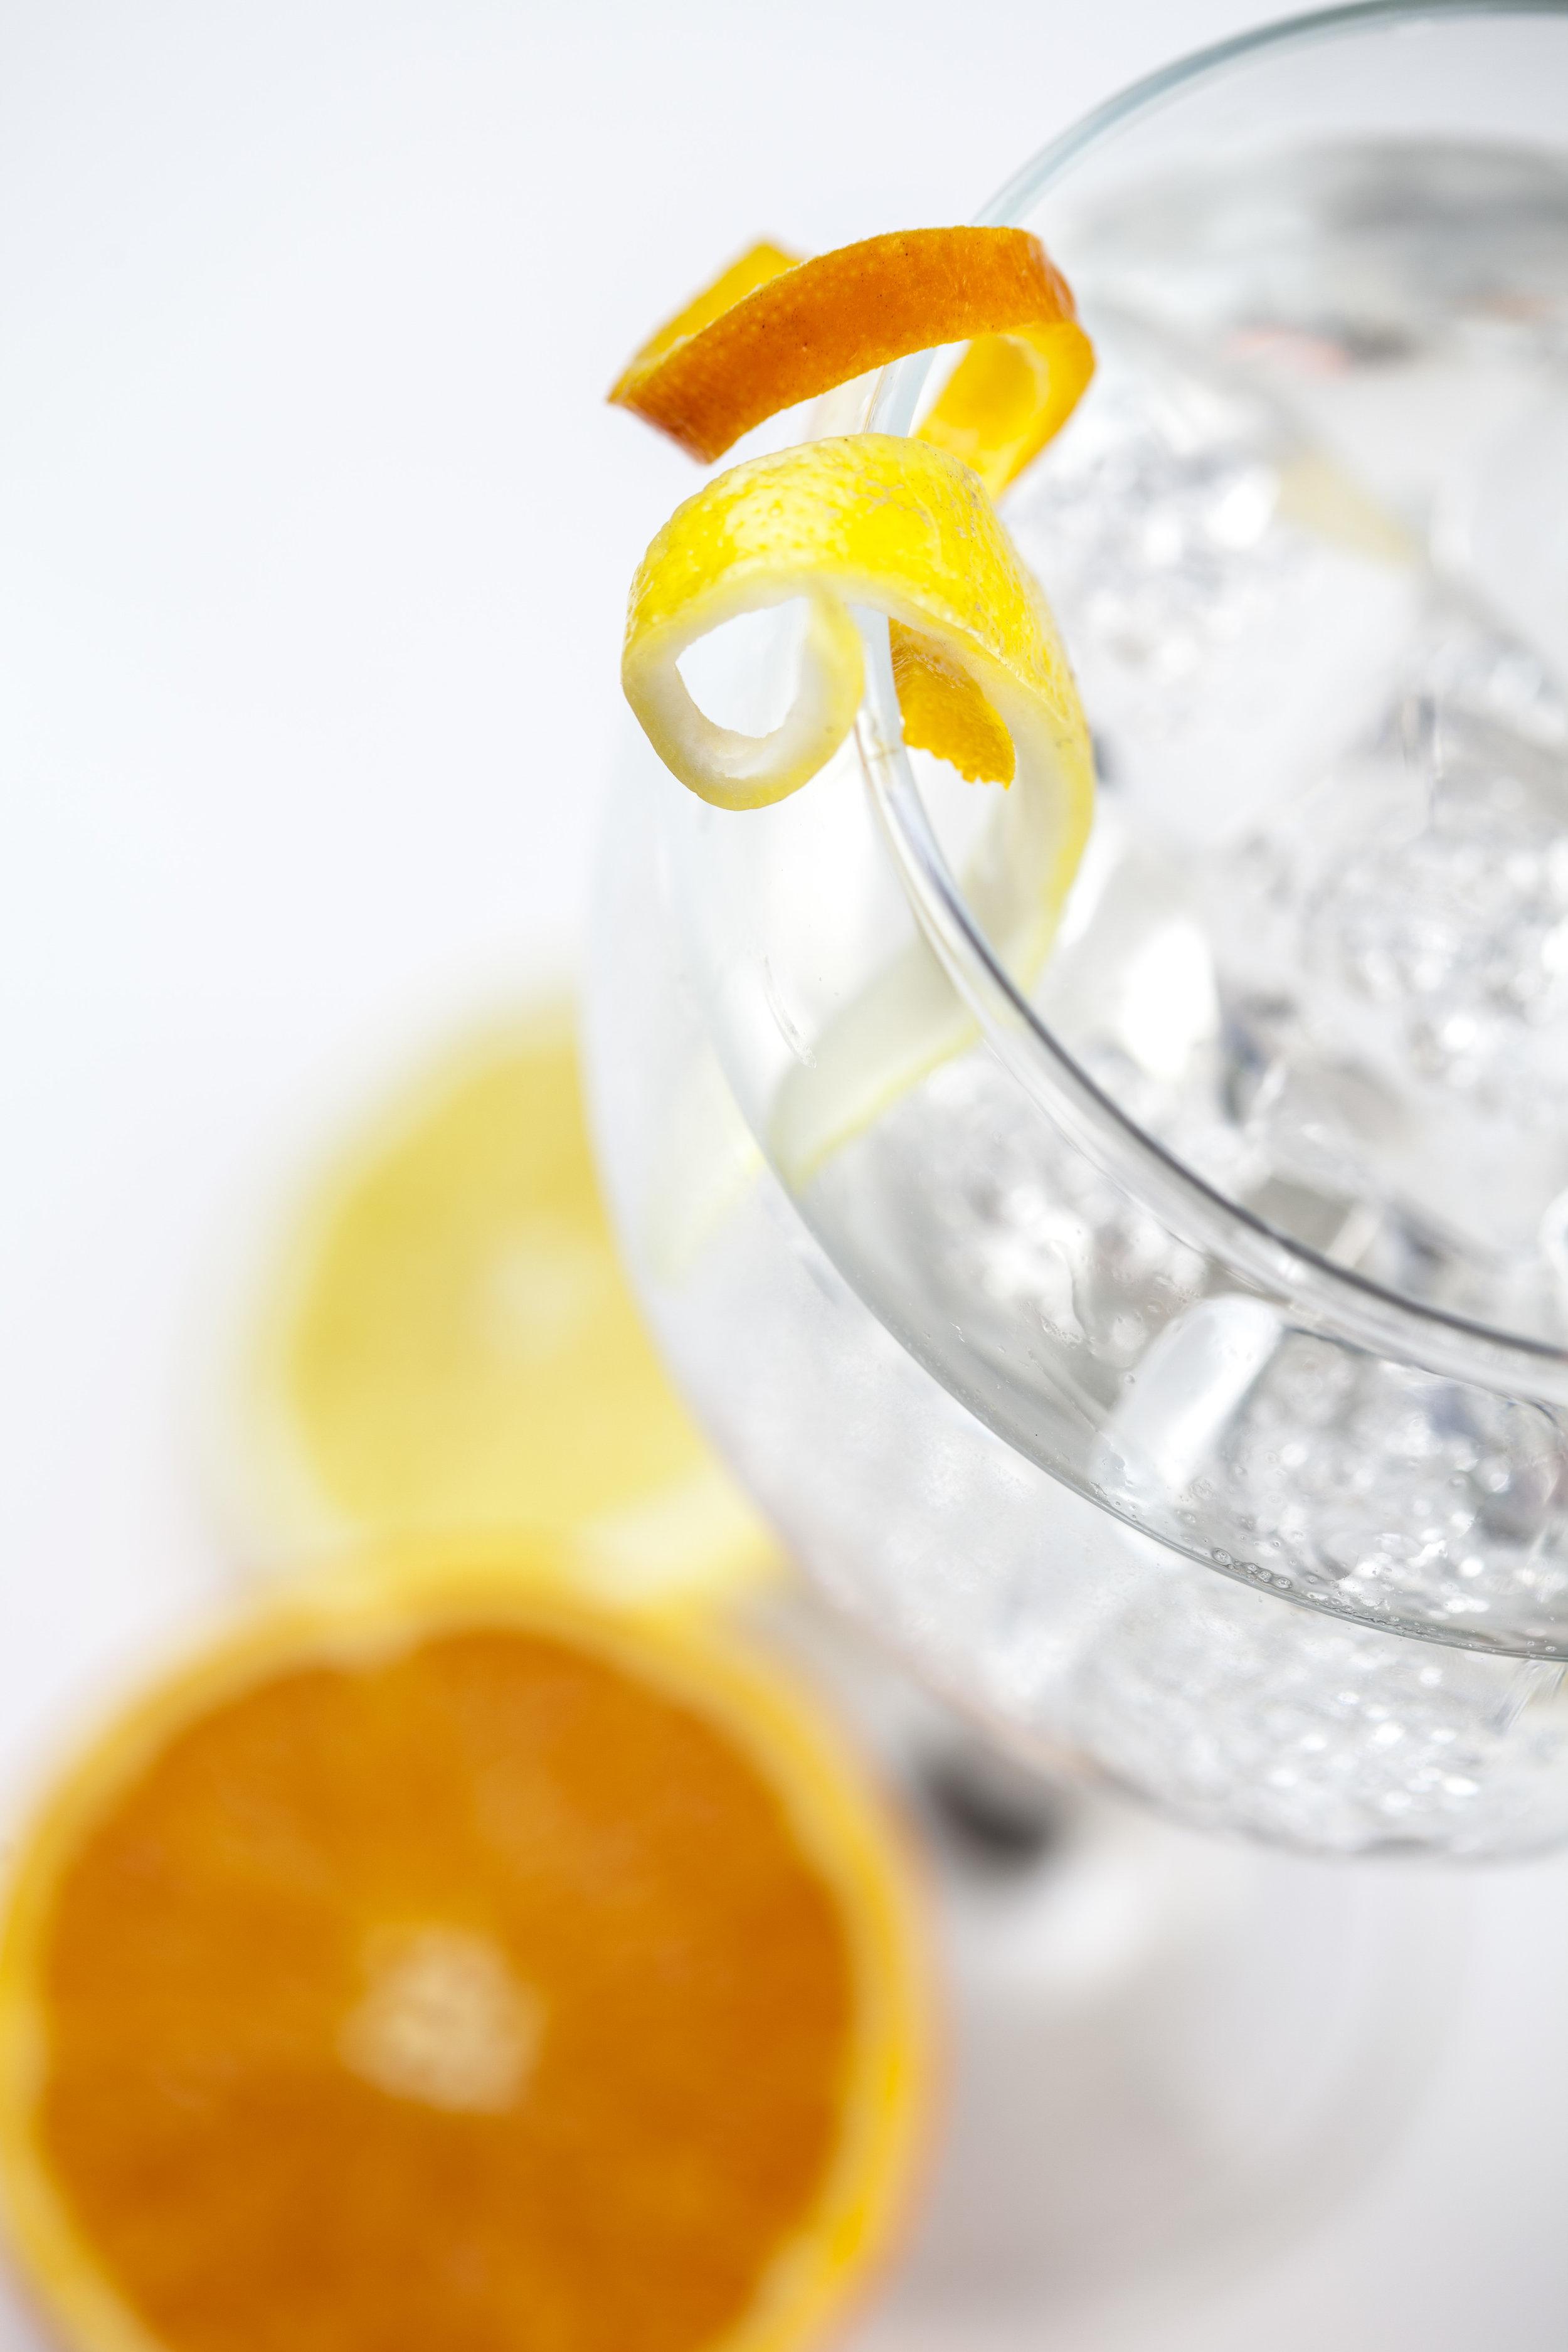 Norwegian Wood - 1 oz. Hayman's Old Tom Gin, 1 oz. Mizu lemongrass shochu, .5 oz. ginger demerara syrup, 2 dashes 1821 Earl Grey bitters lime or lemon and top with   Indi & Co strawberry tonic.